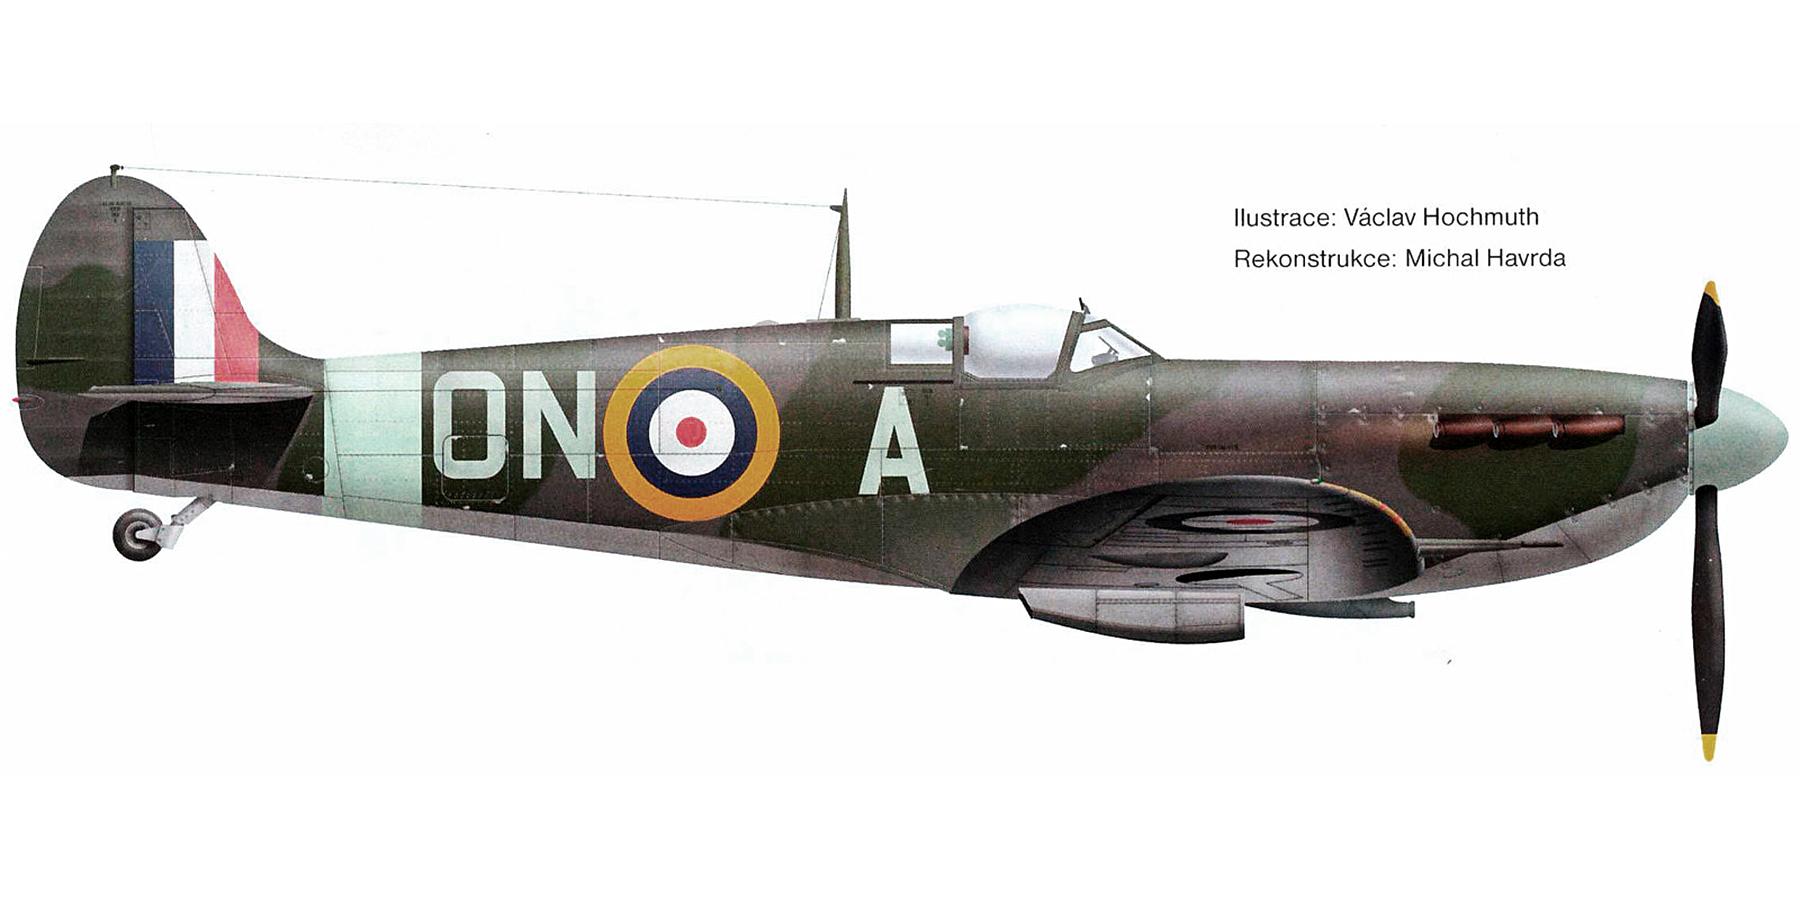 Spitfire MkVb RAF 124Sqn ONA flown by Michael Reid AA761 Biggin Hill Mar 1942 0A